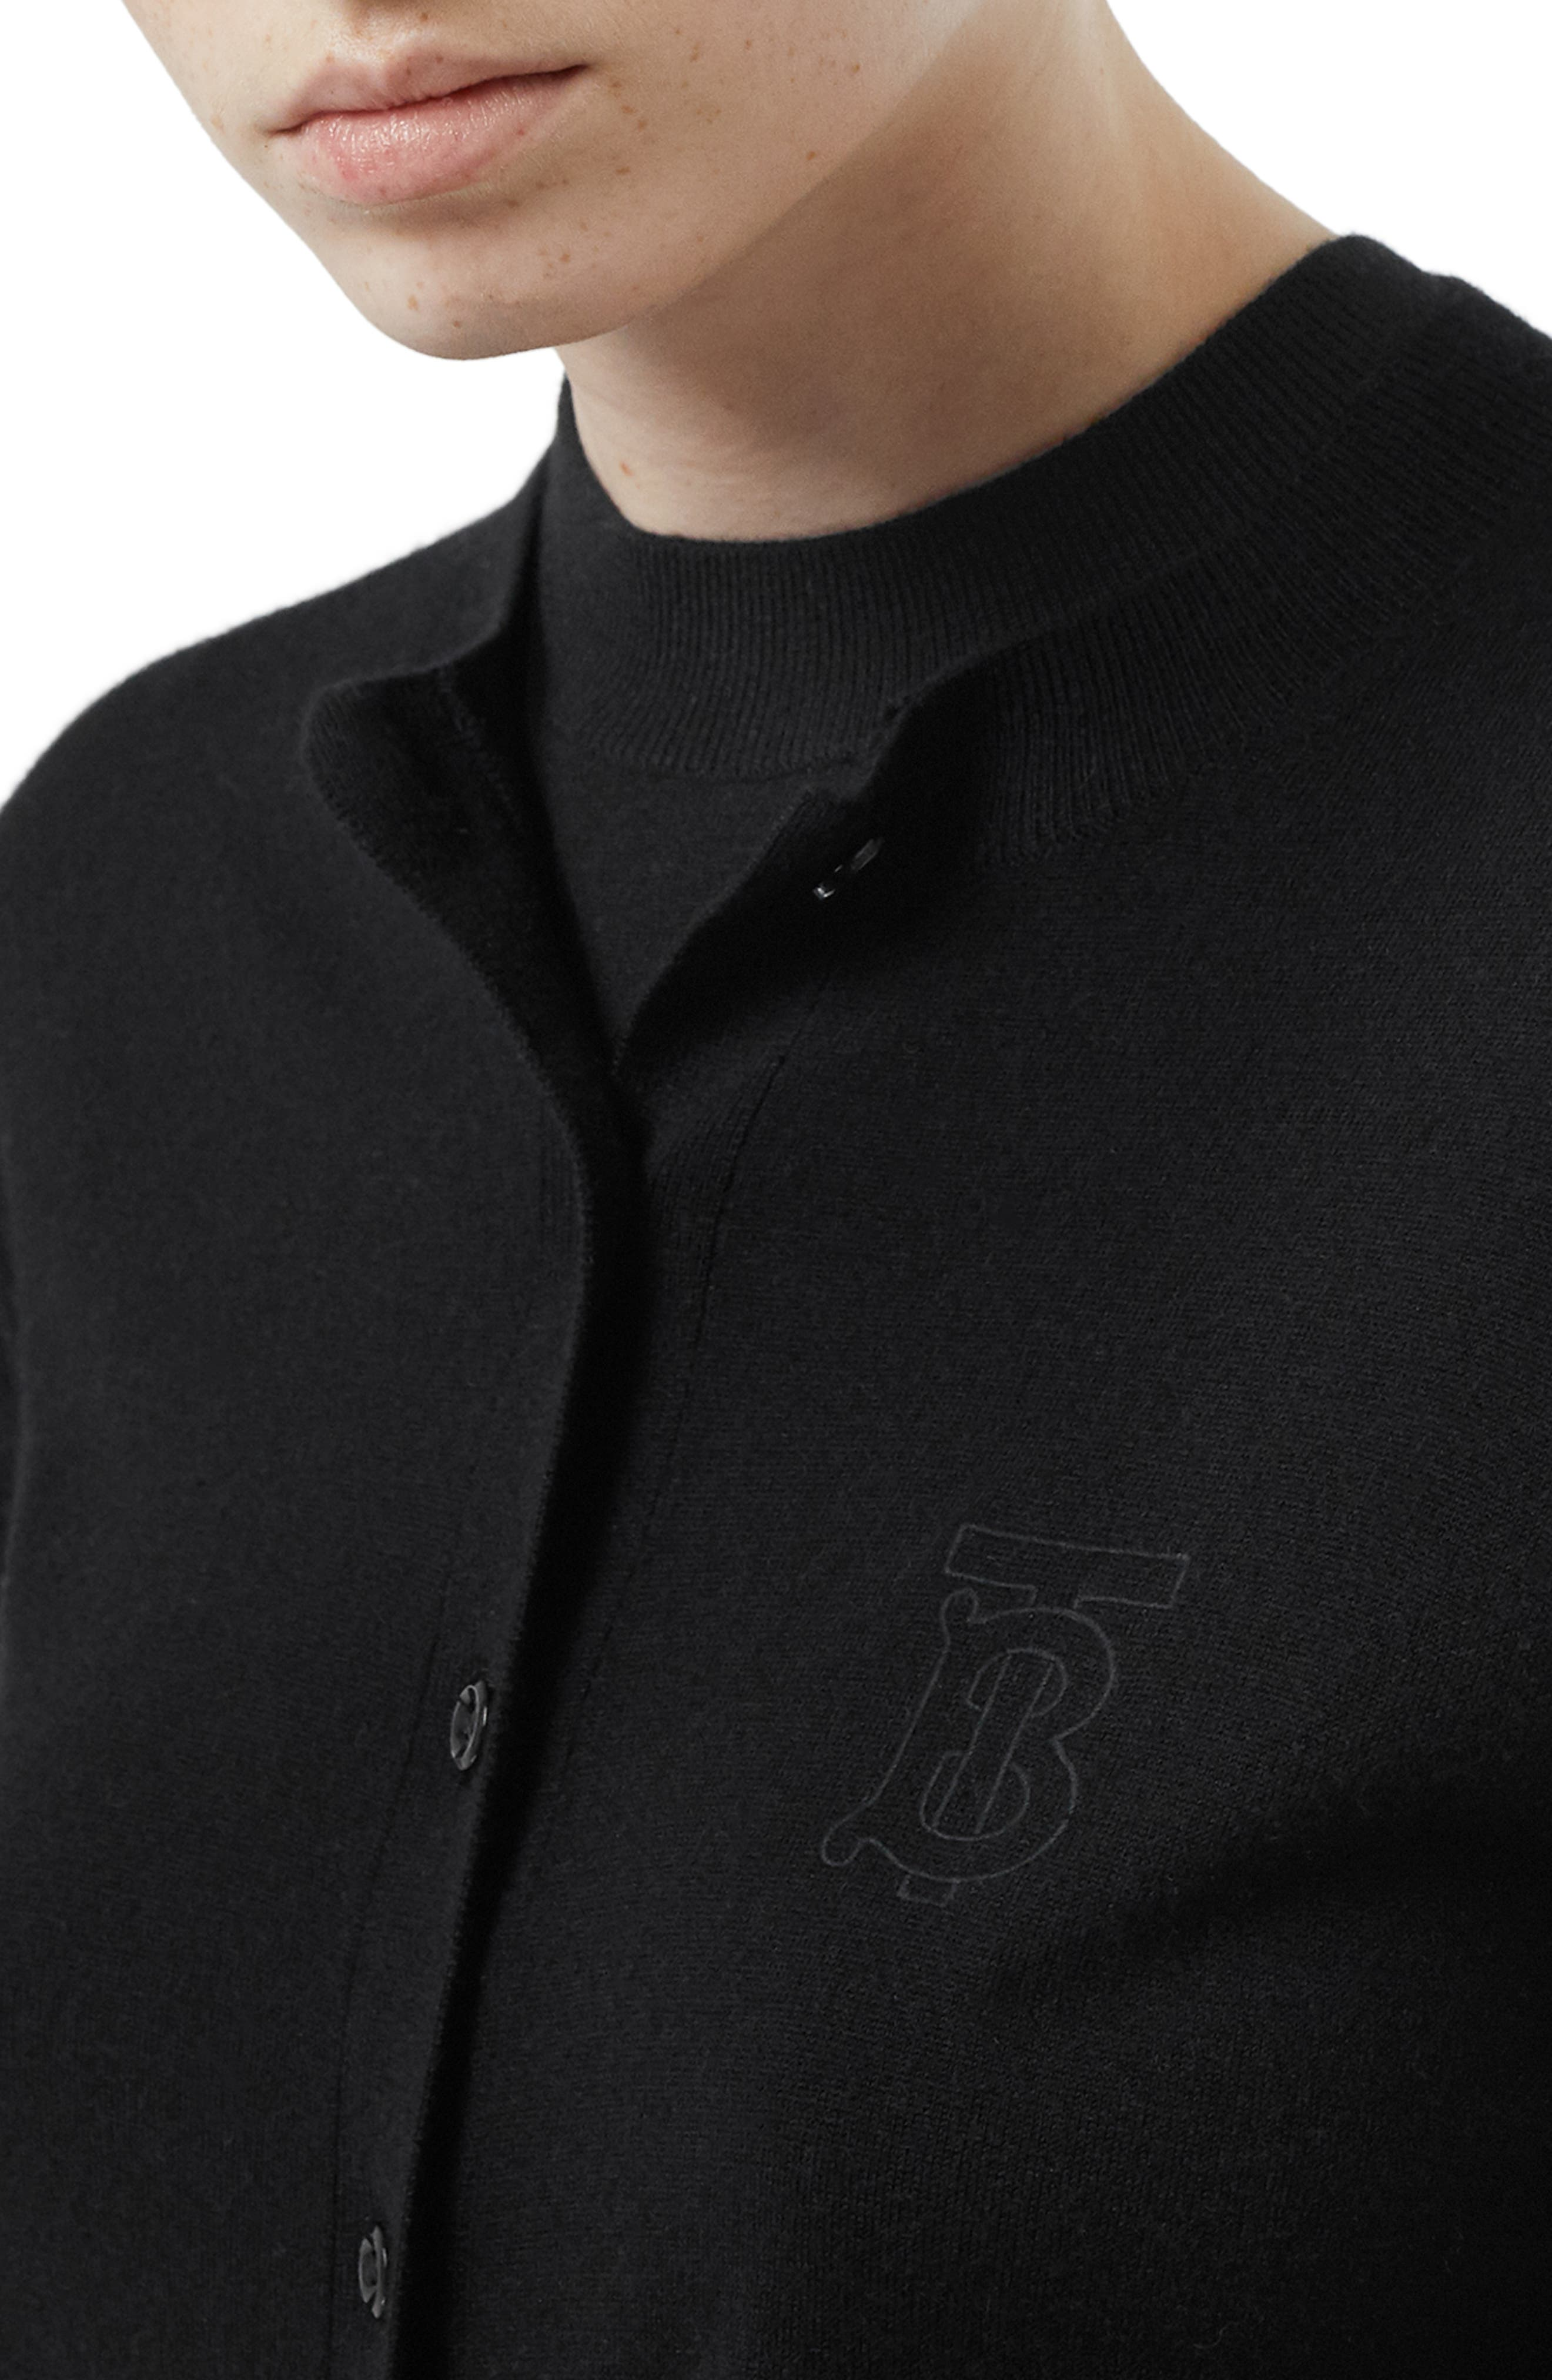 BURBERRY, Monogram Logo Cashmere Cardigan, Alternate thumbnail 4, color, BLACK